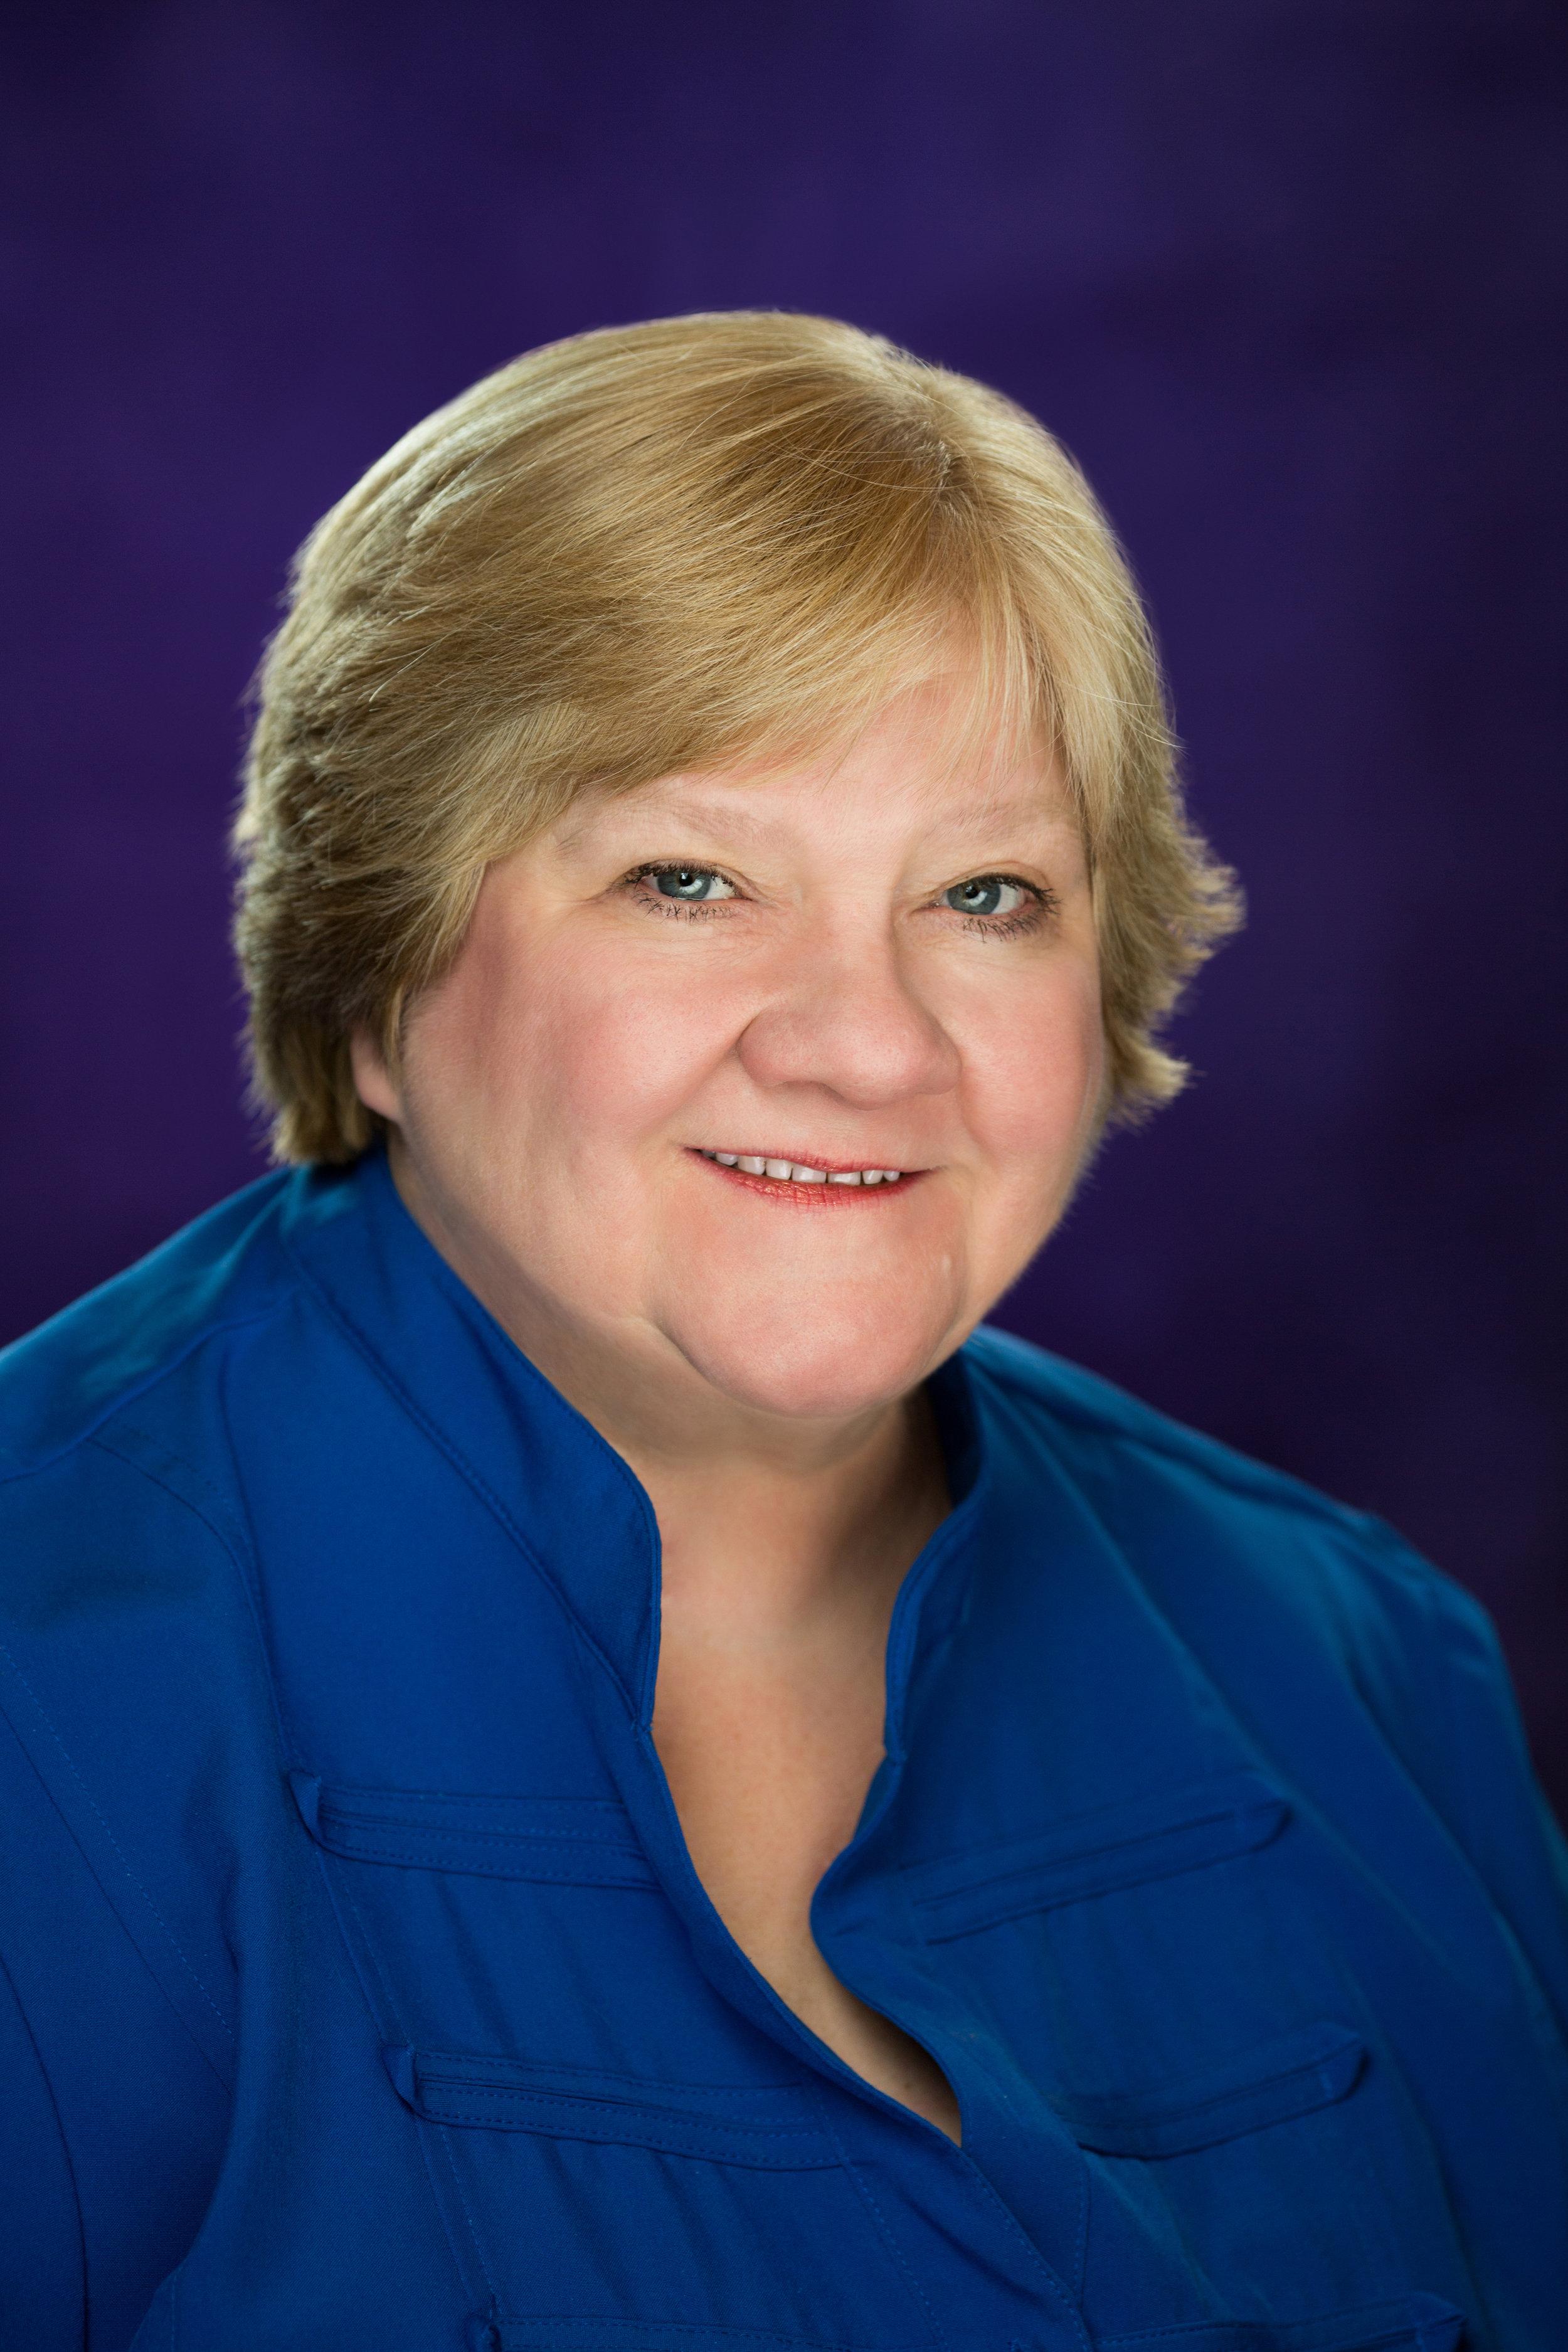 Kathy McGarry